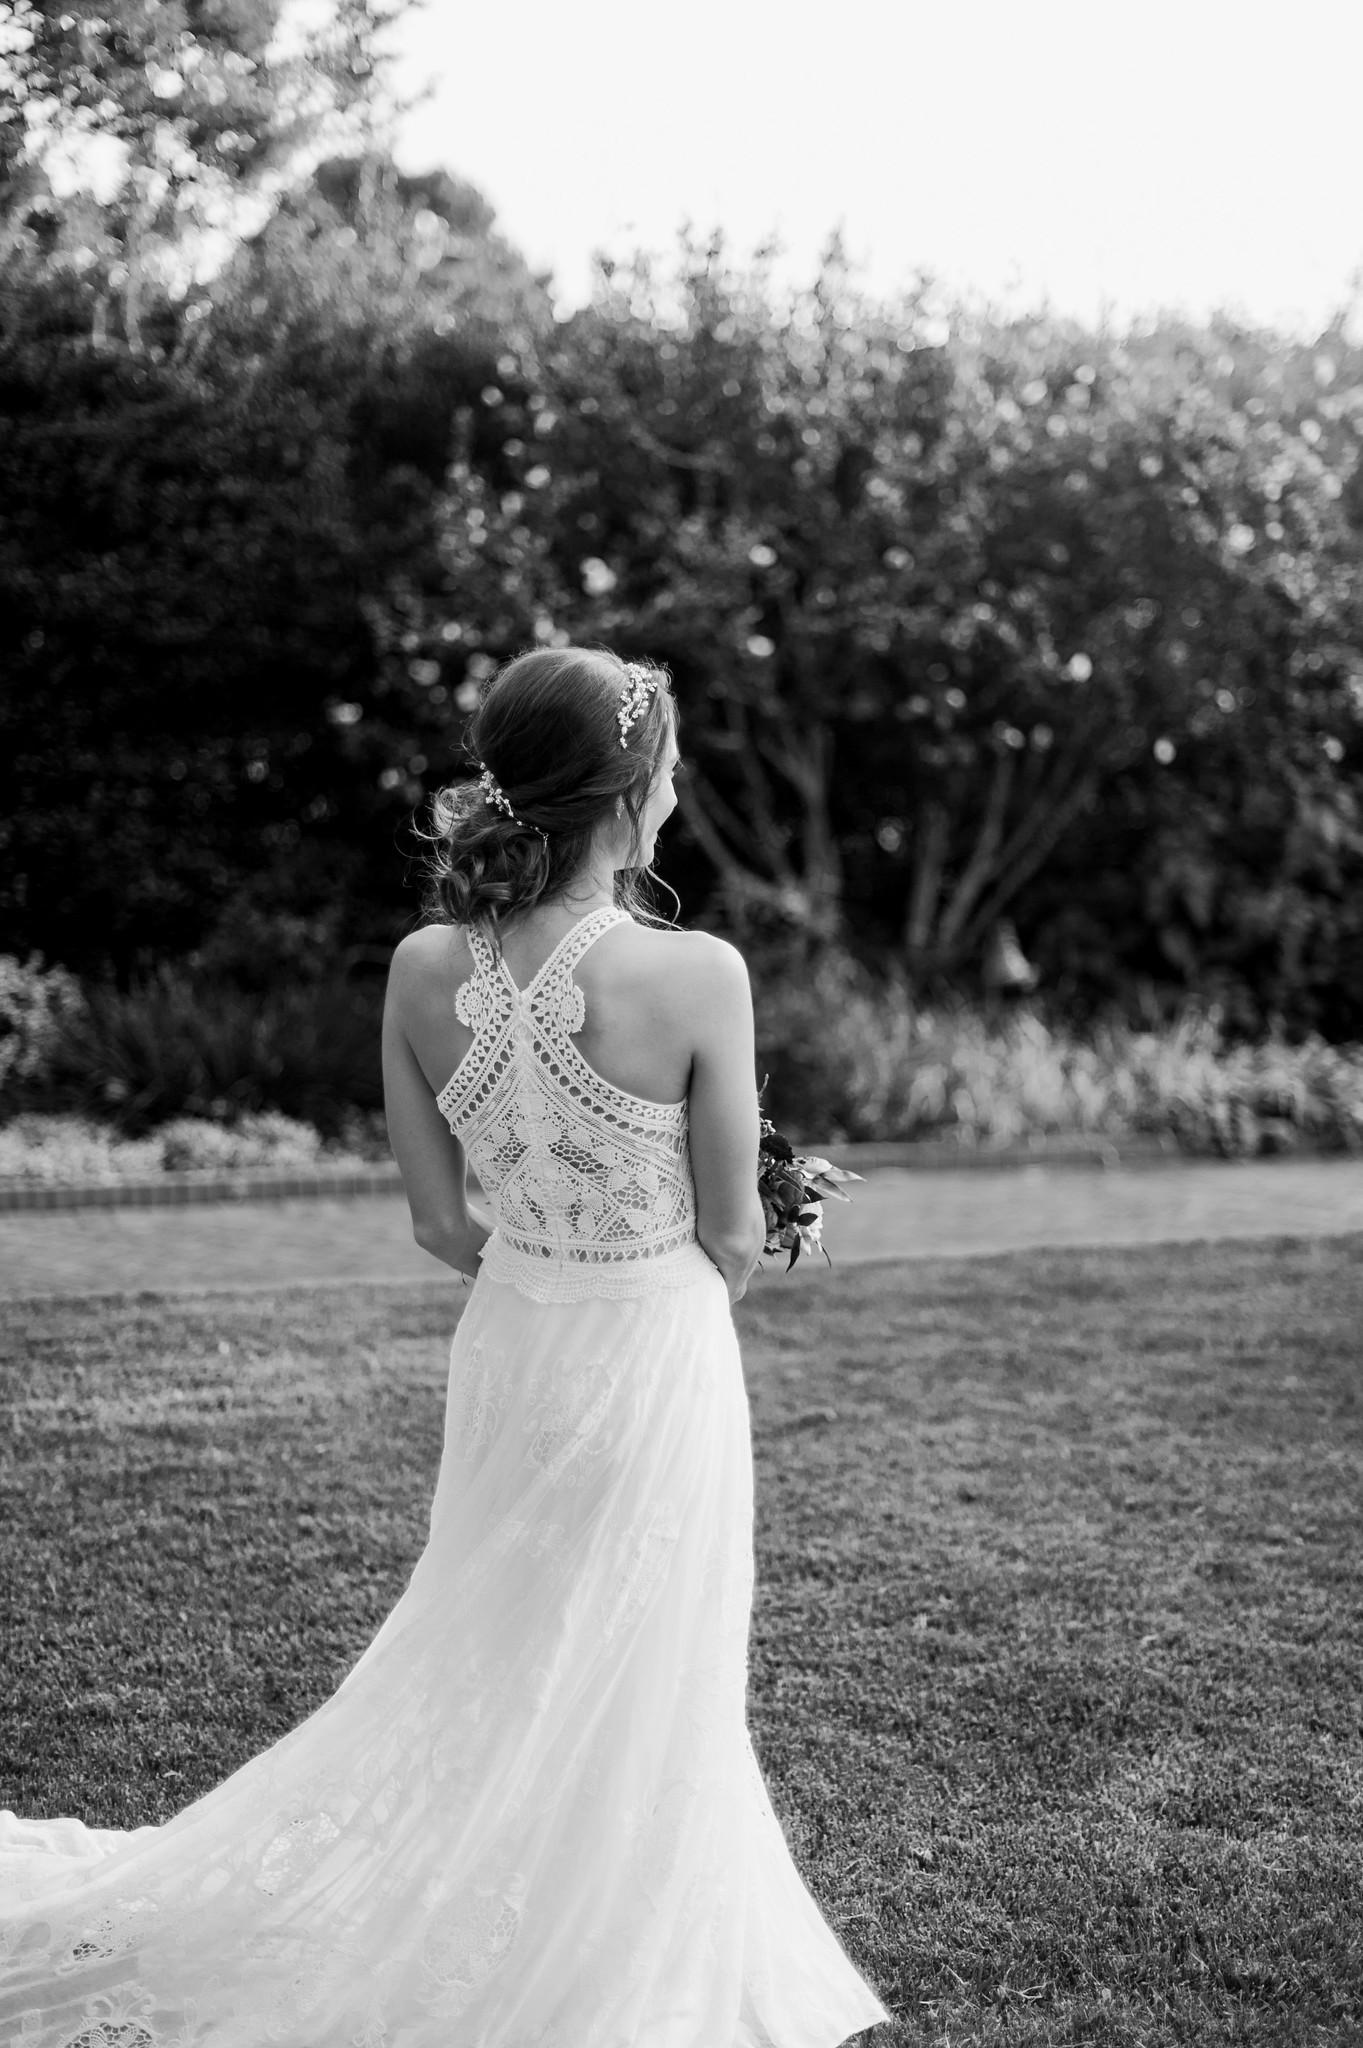 thomas-wedding-083-X4.jpg